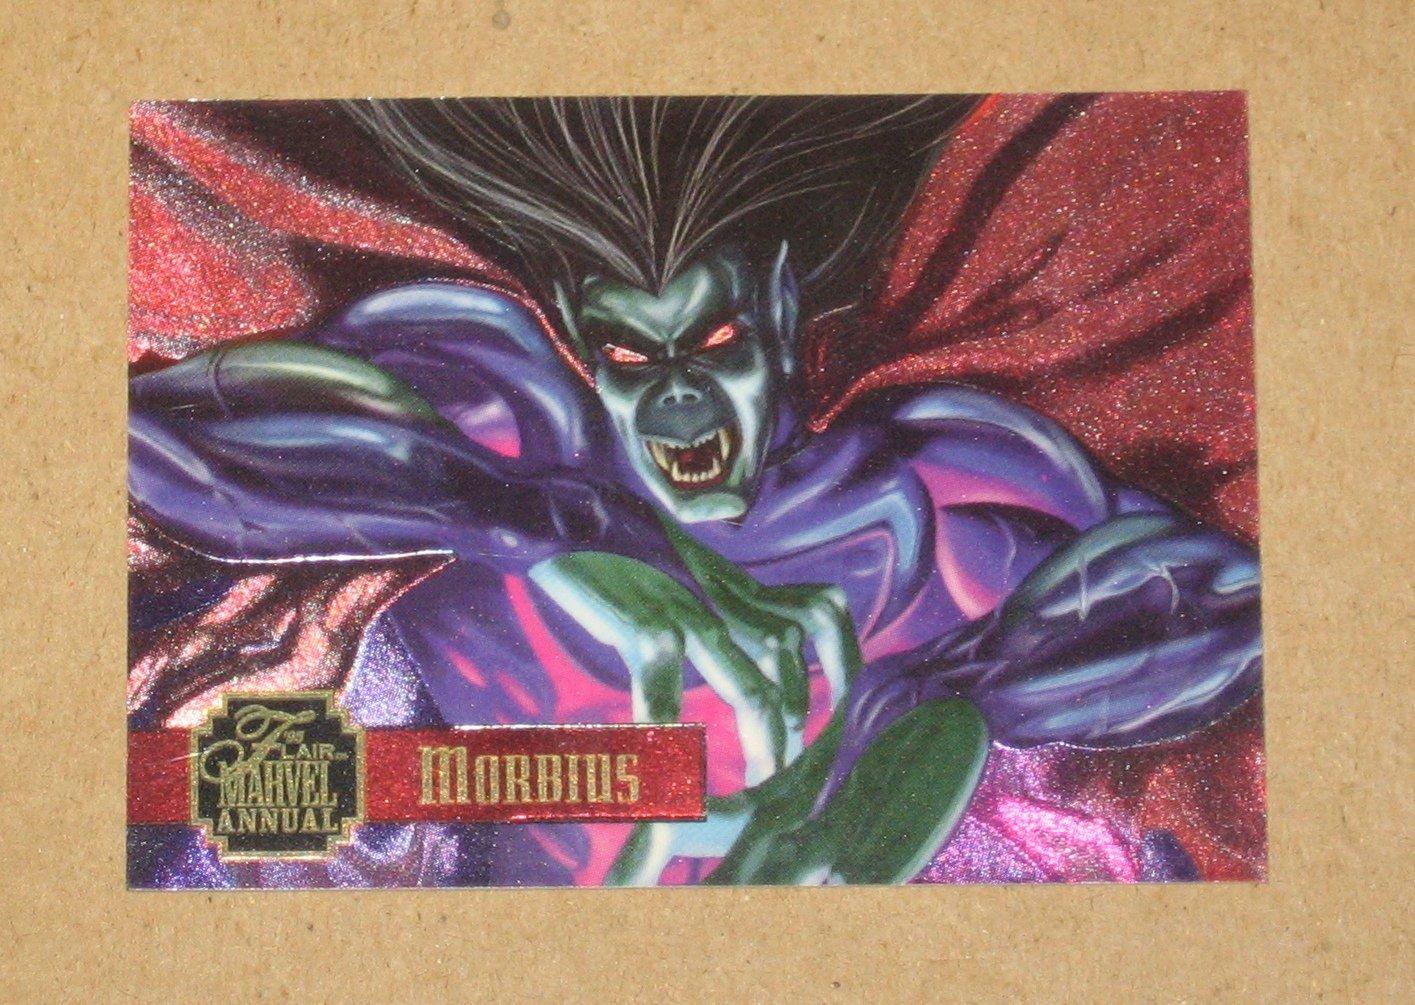 Flair '95 Marvel Annual (Fleer 1995) PowerBlast Card #10- Morbius VG